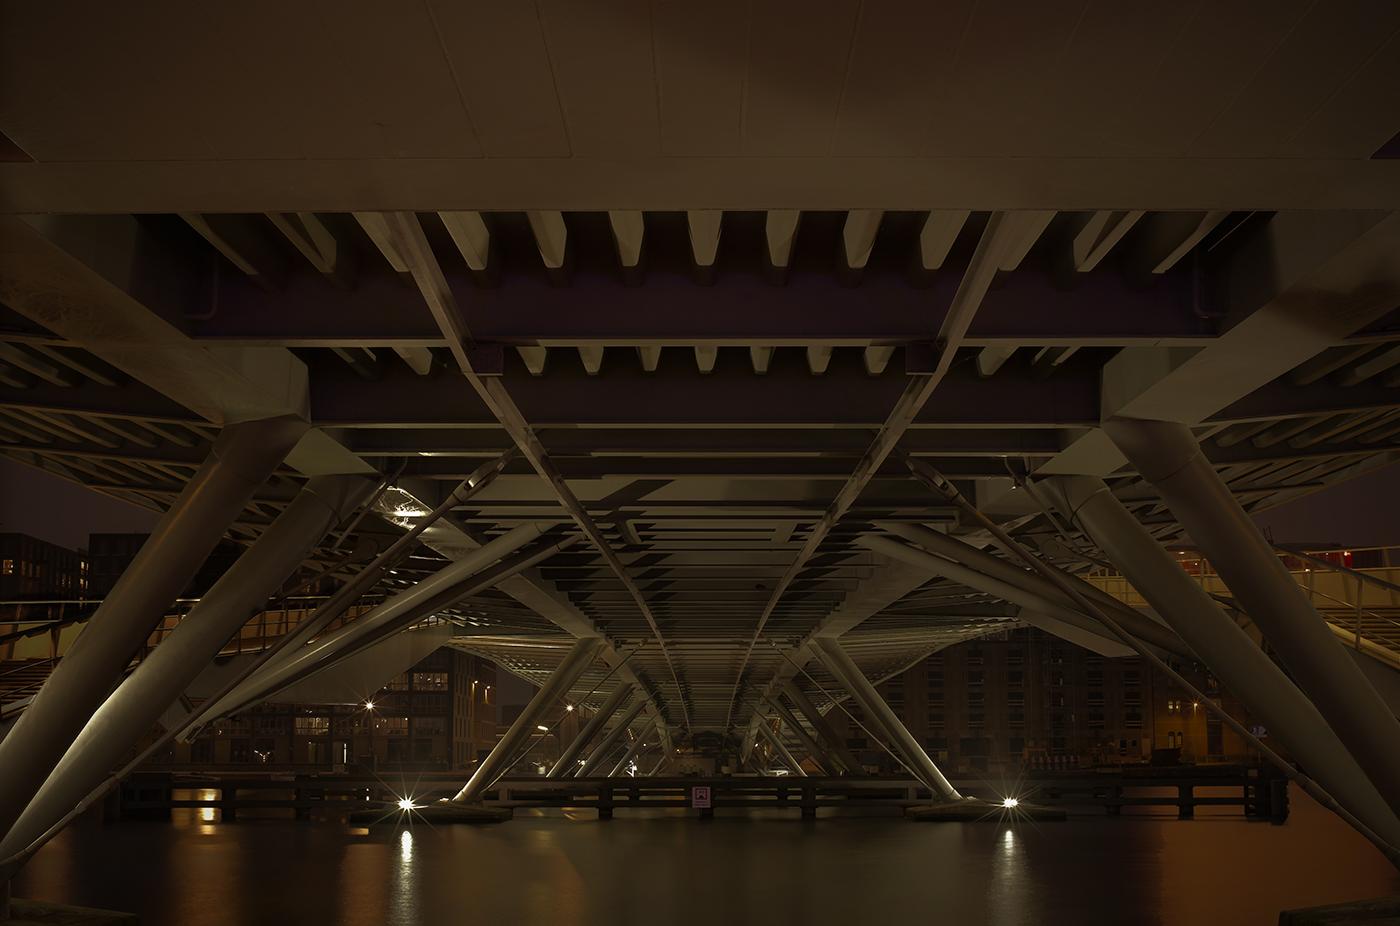 Schaefer bridge #1